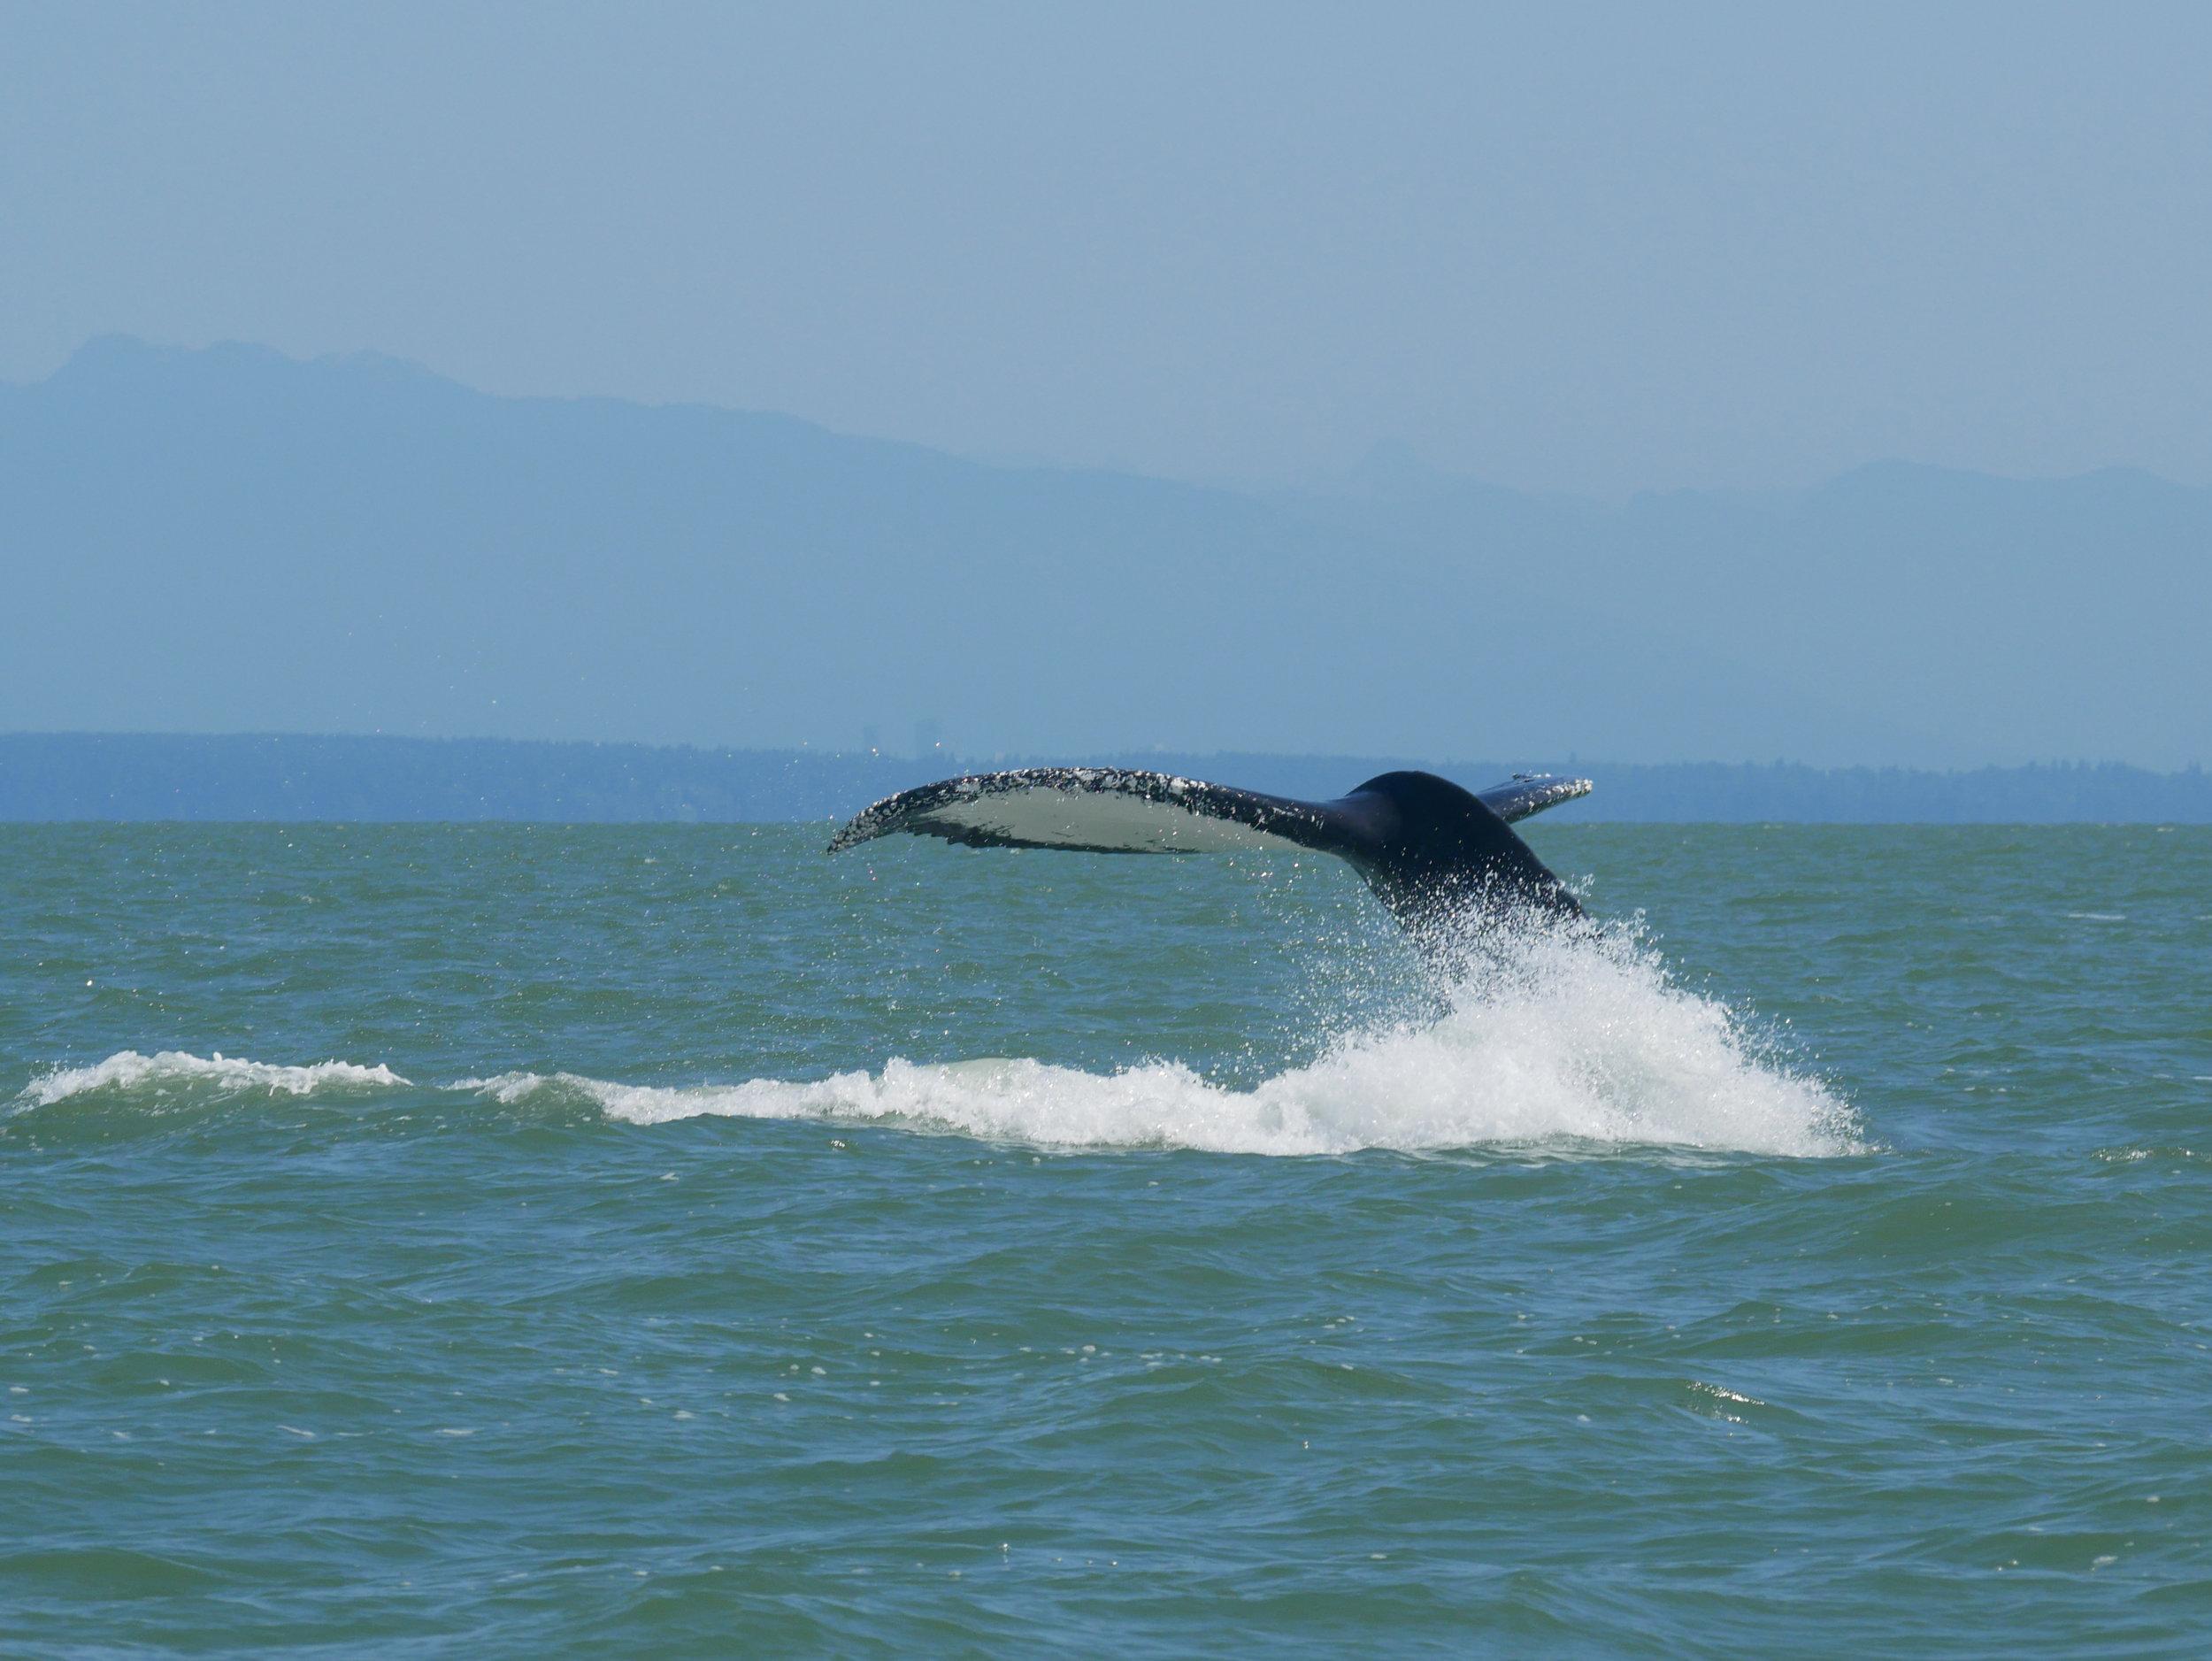 Anvil mid tail slap! Photo by Cheyenne Brewster (10:30).